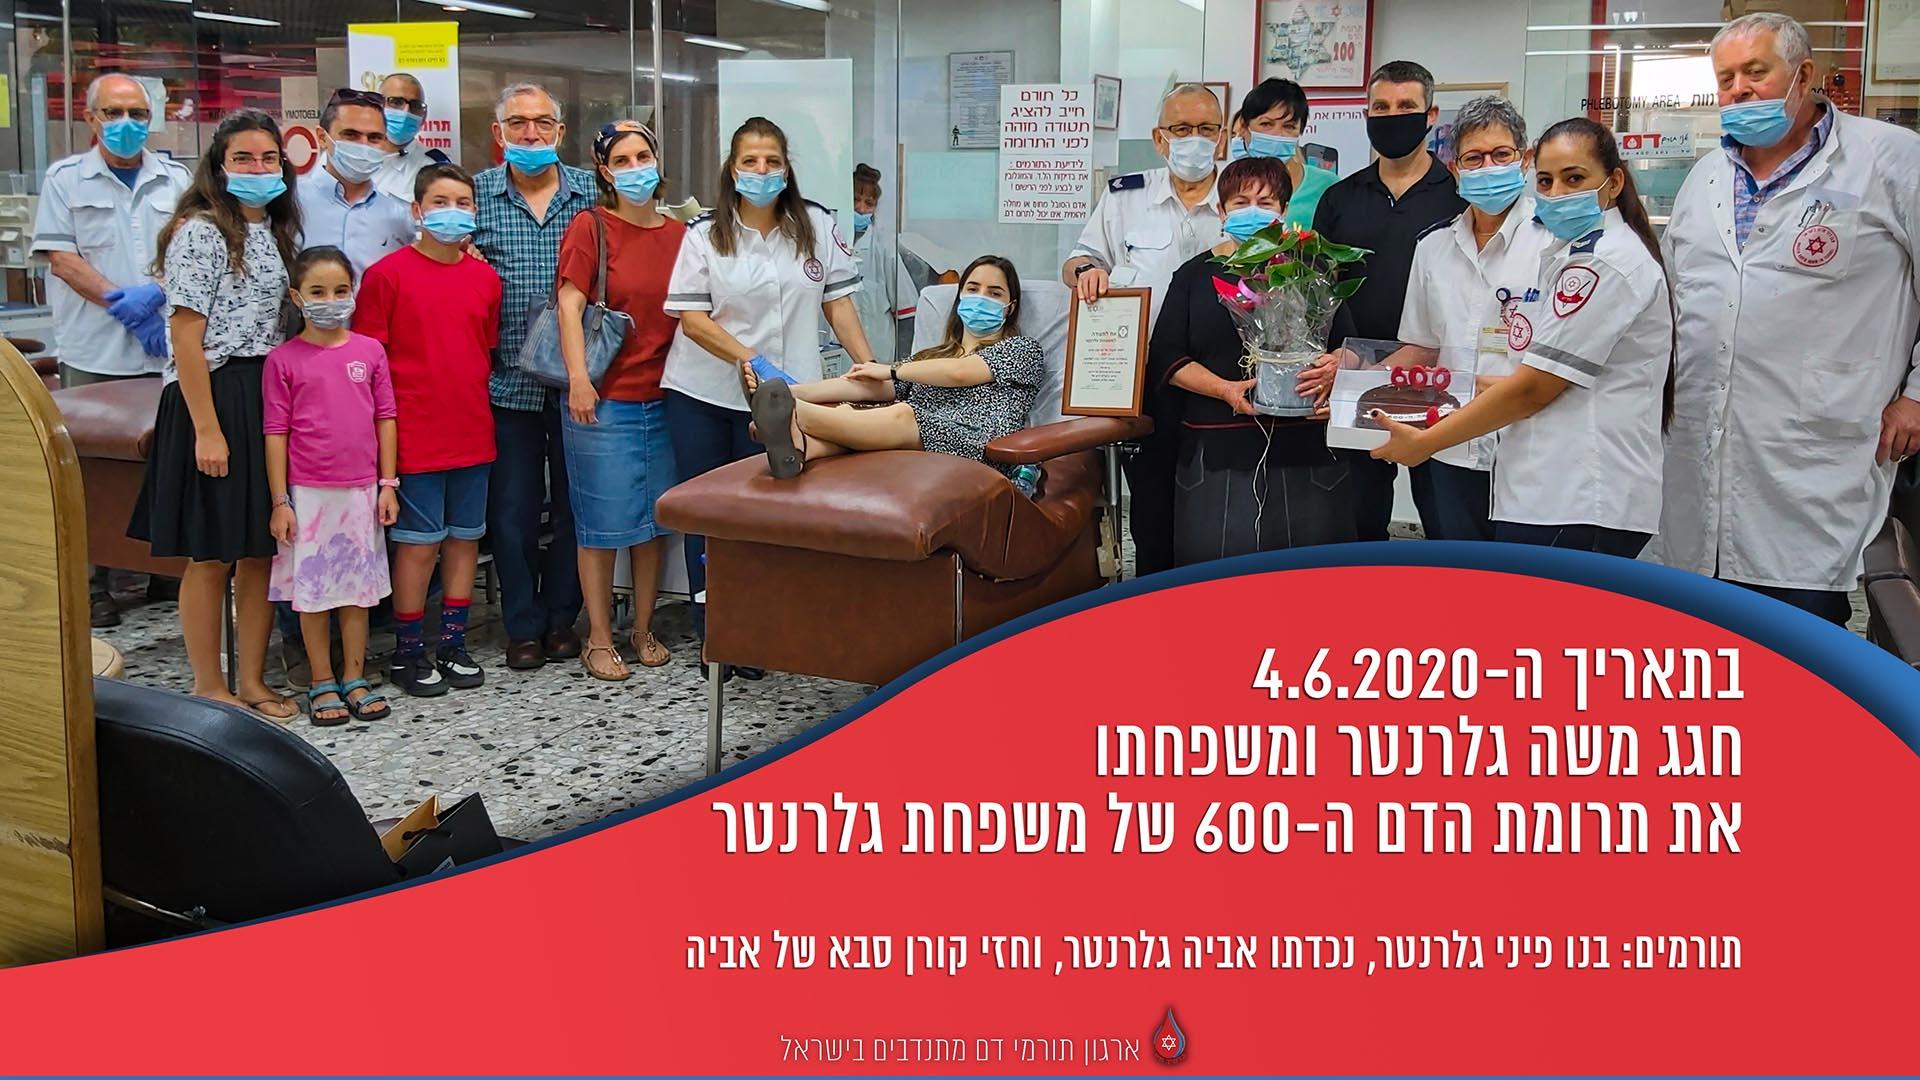 Отпразднуйте 600 пожертвований крови семьей Глернтер